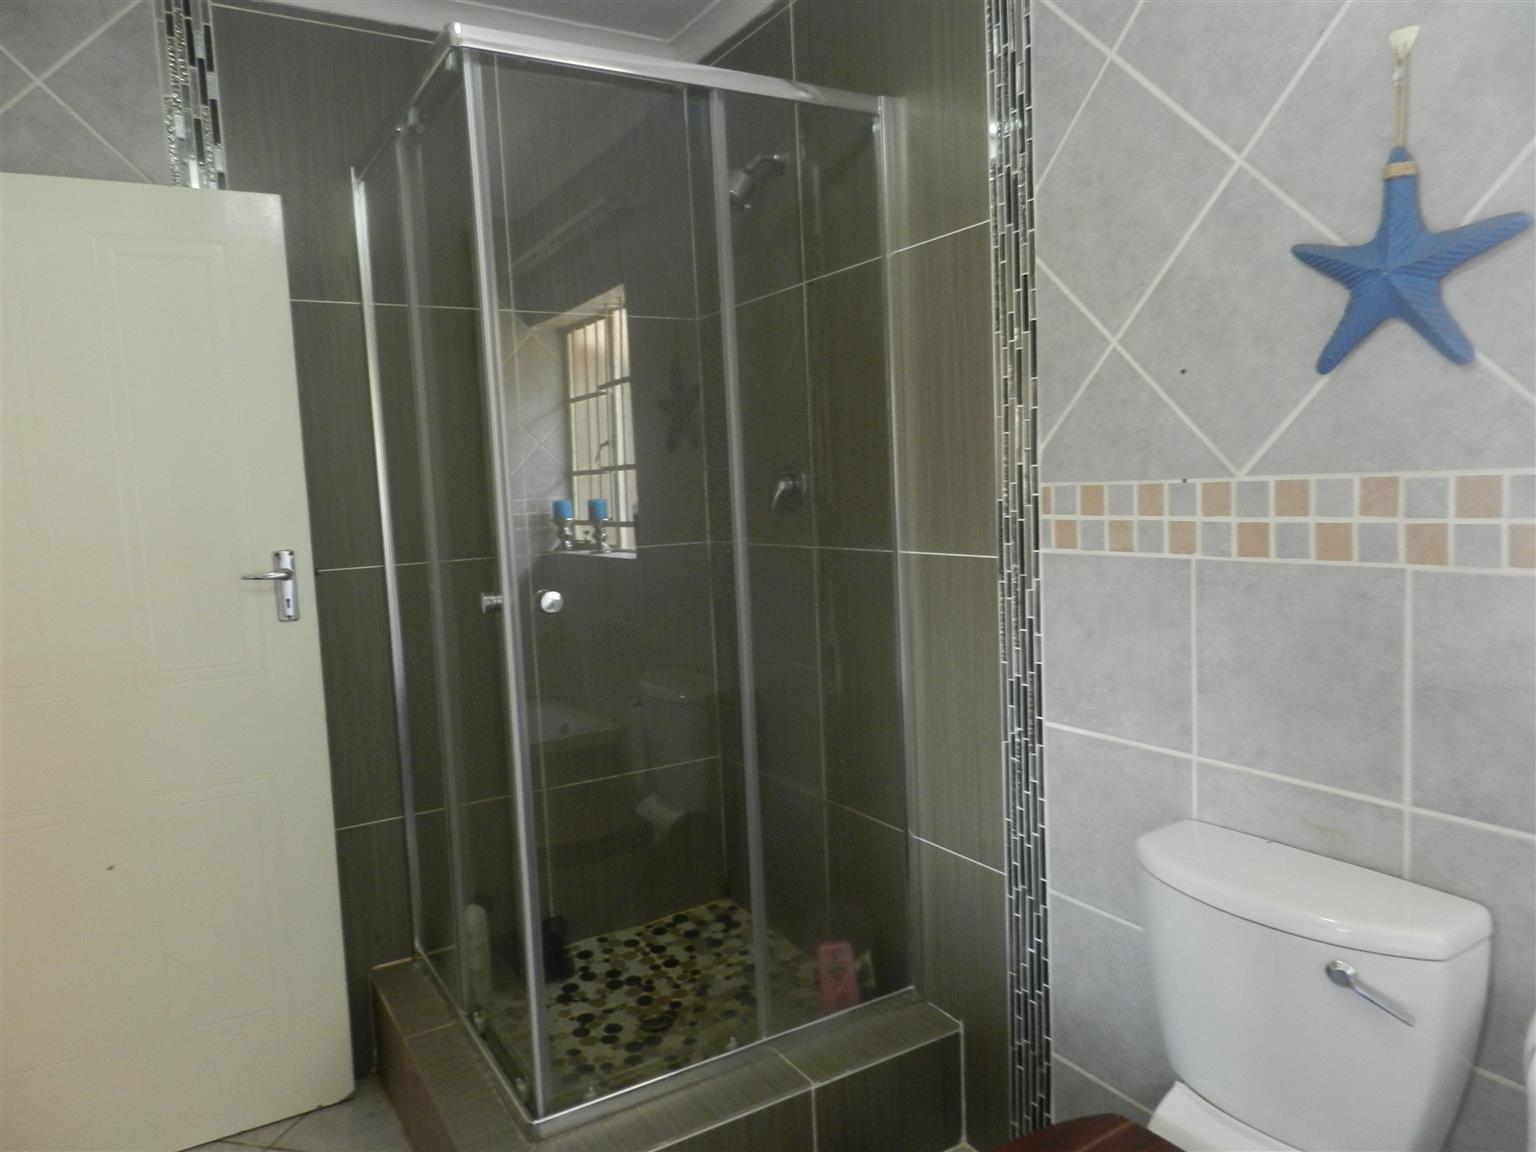 2 Bedroom Townhouse for Sale in Florauna Pretoria North